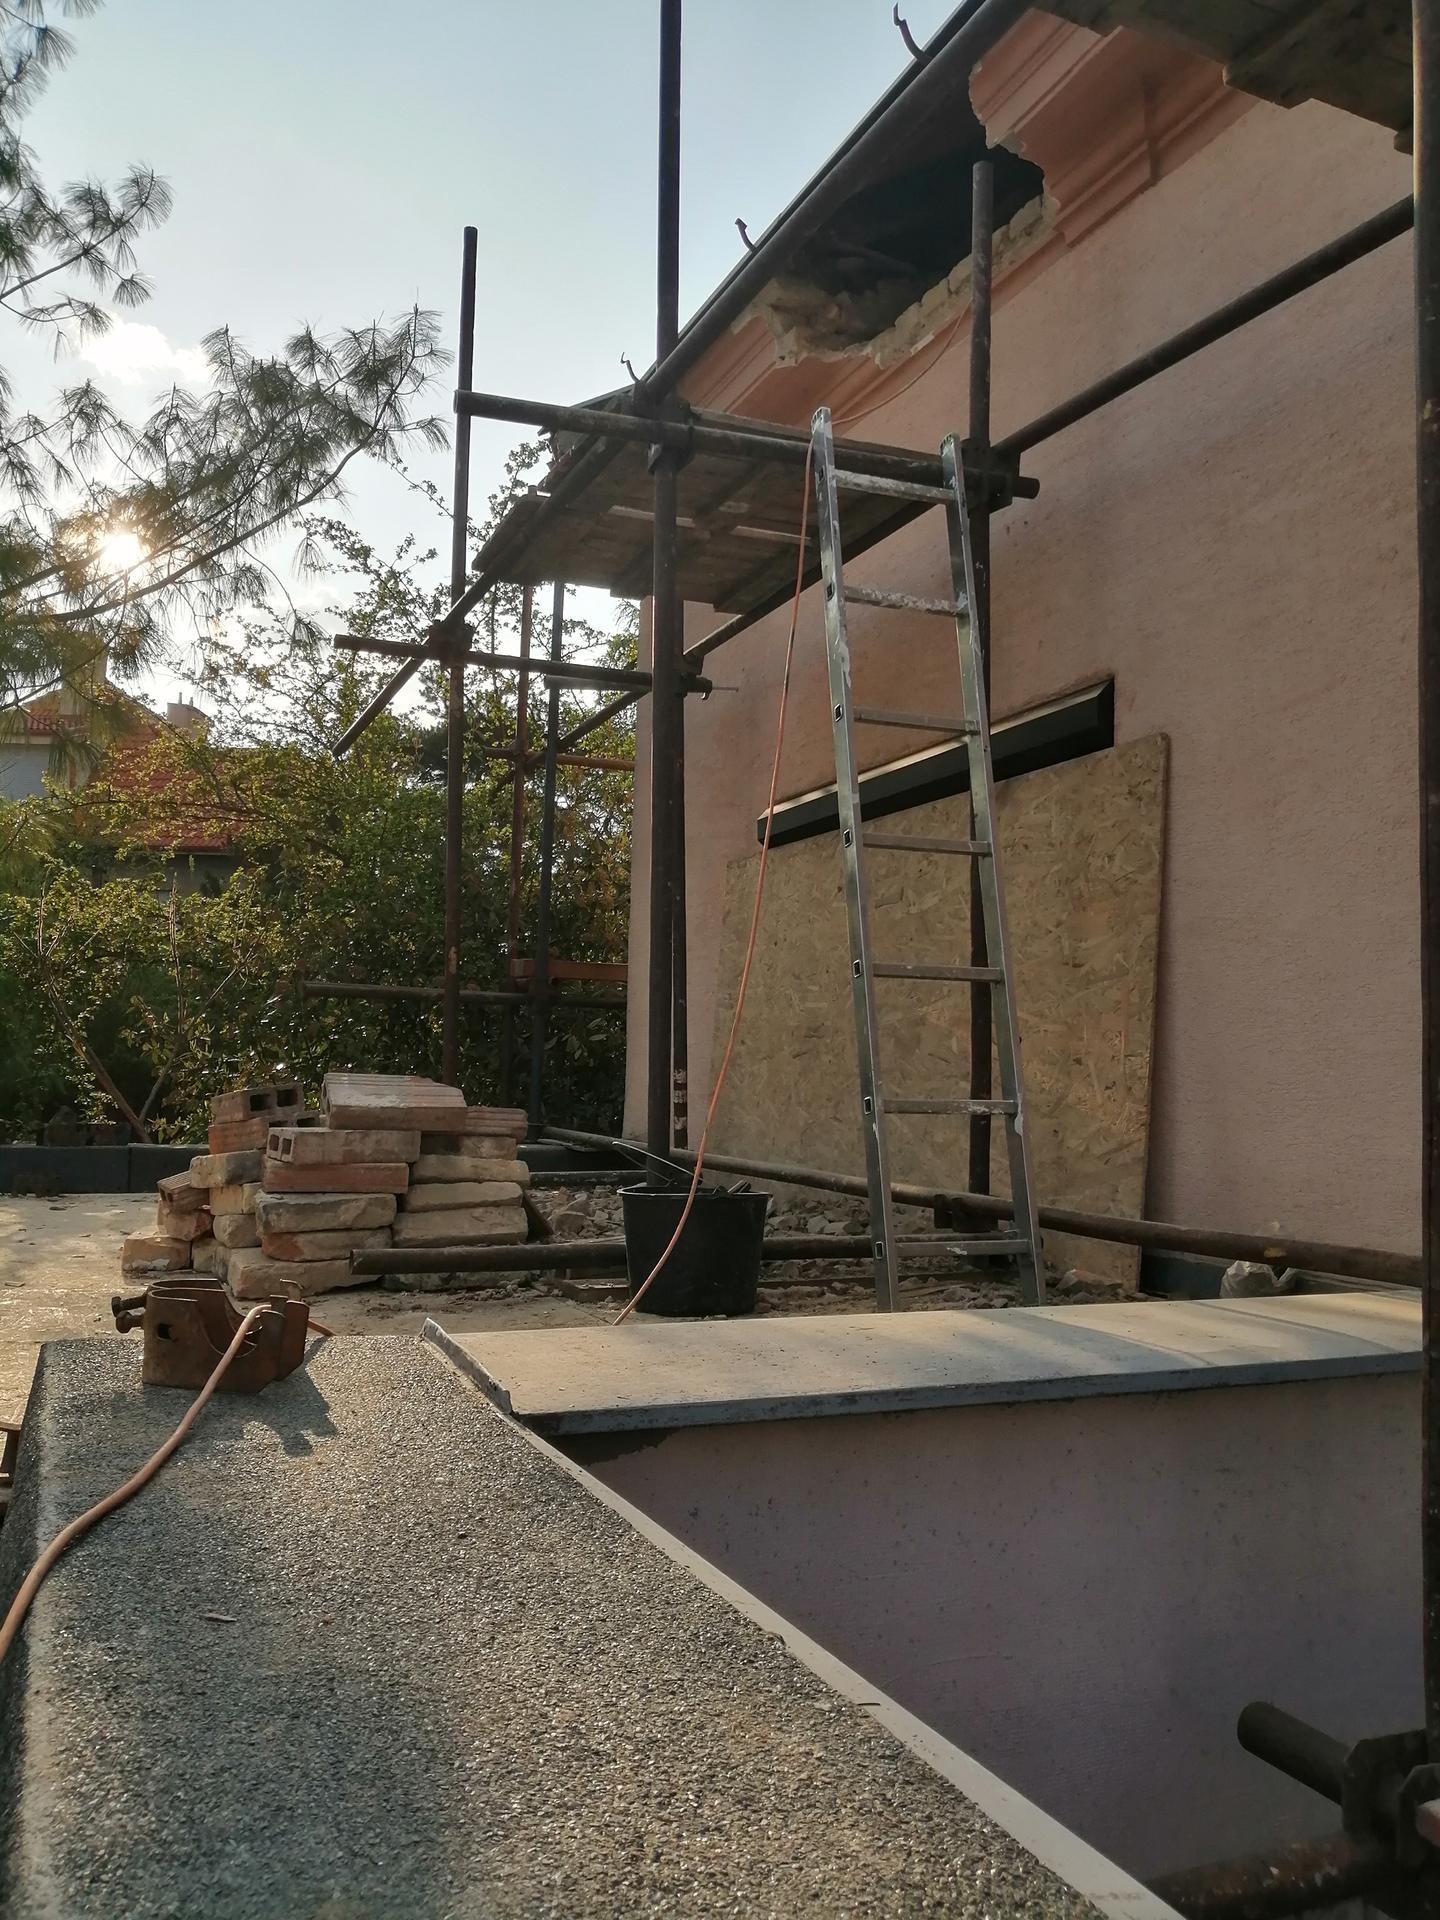 Prestavba podkrovia zo sedlovo valbovej na sedlovú strechu. - Obrázok č. 26